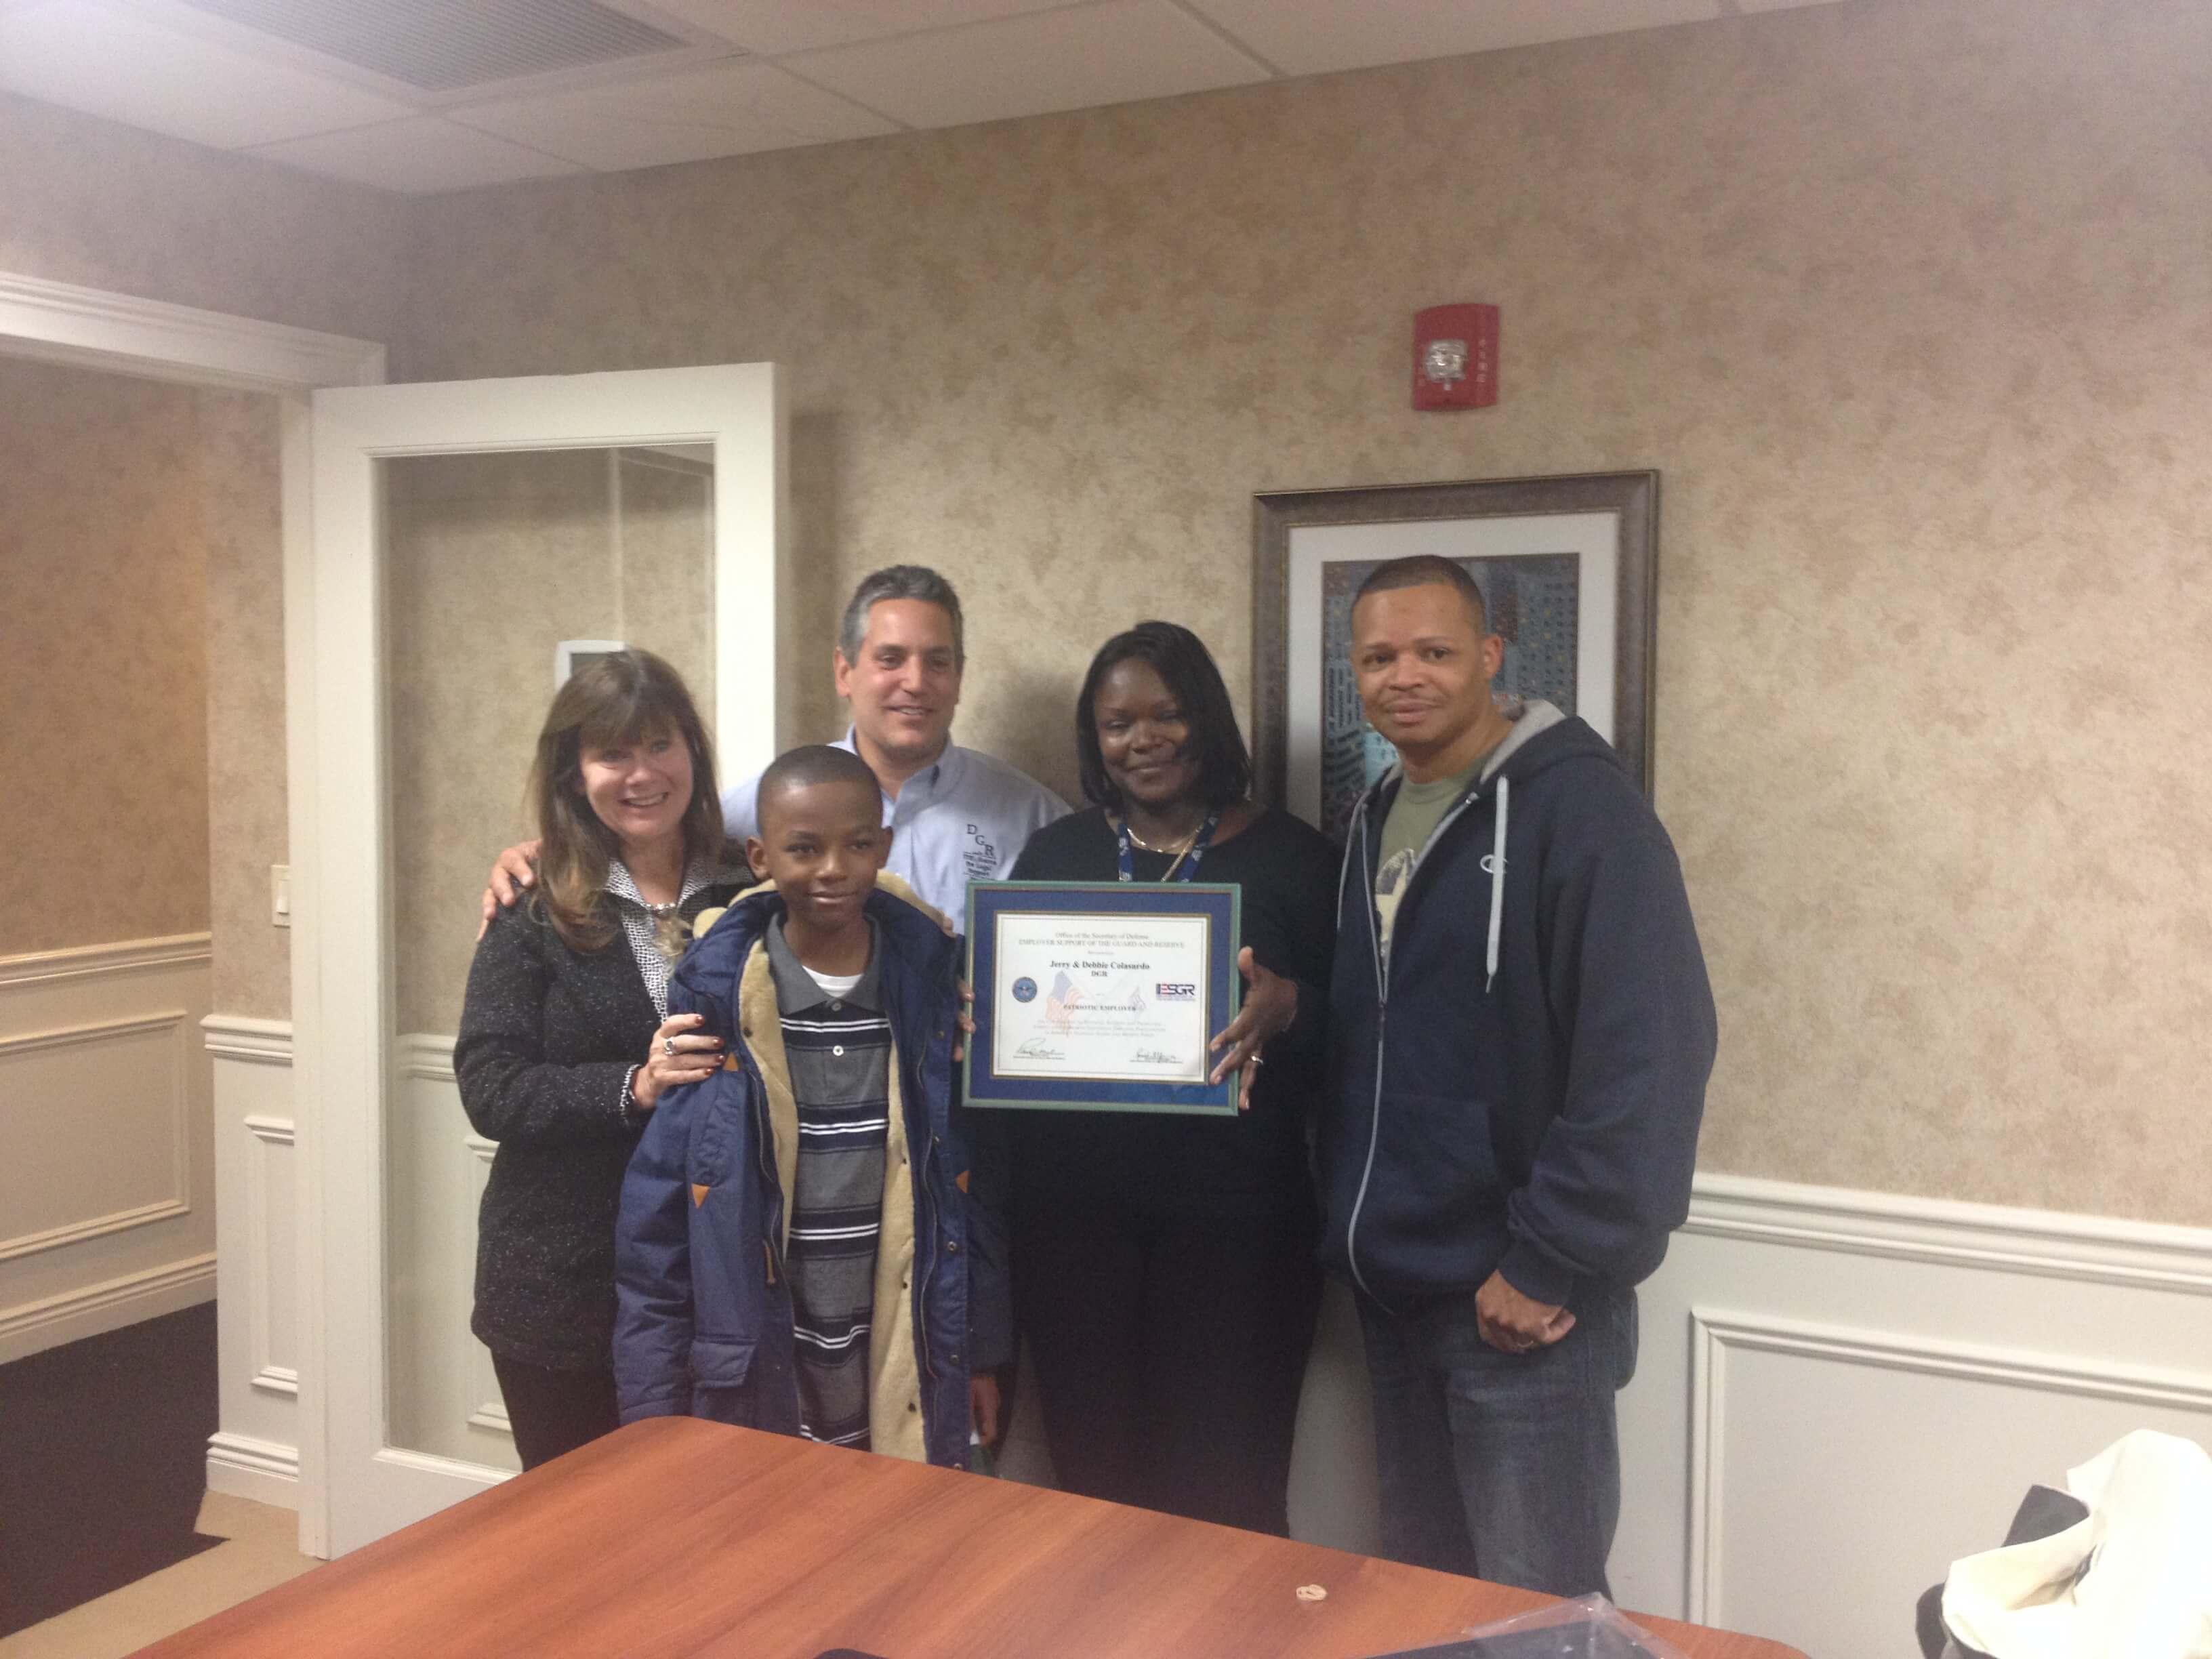 Receiving the Patriot Award